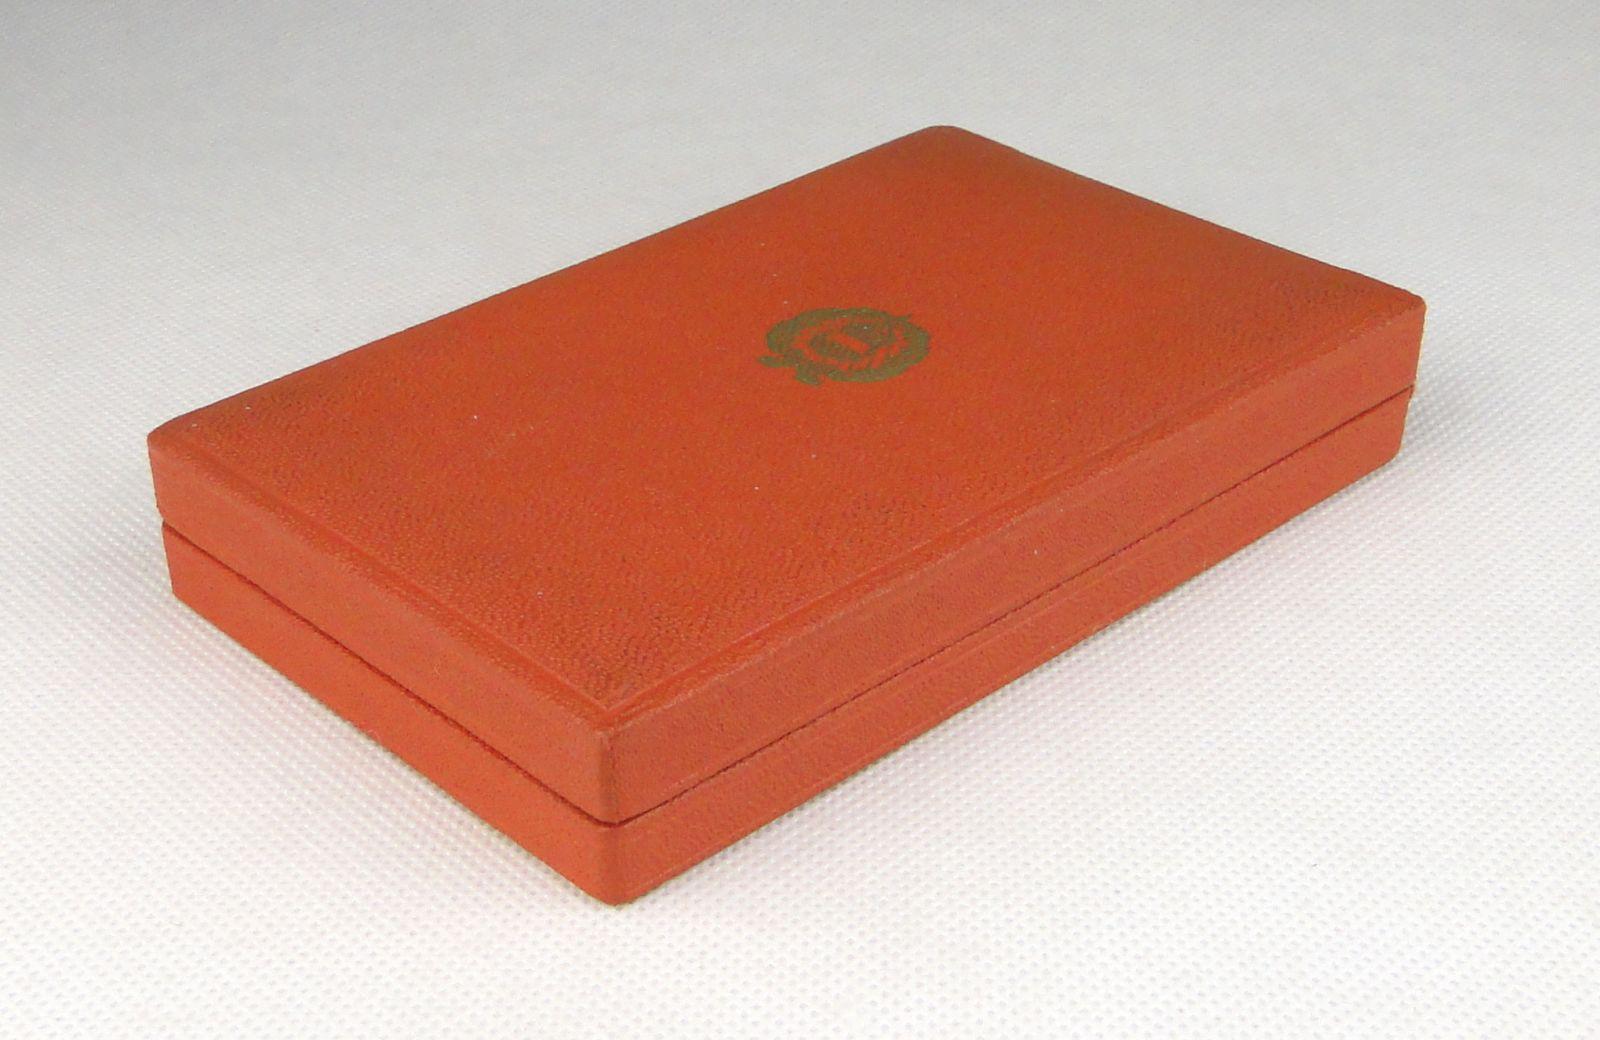 DSC05392.JPG (1600×1040)